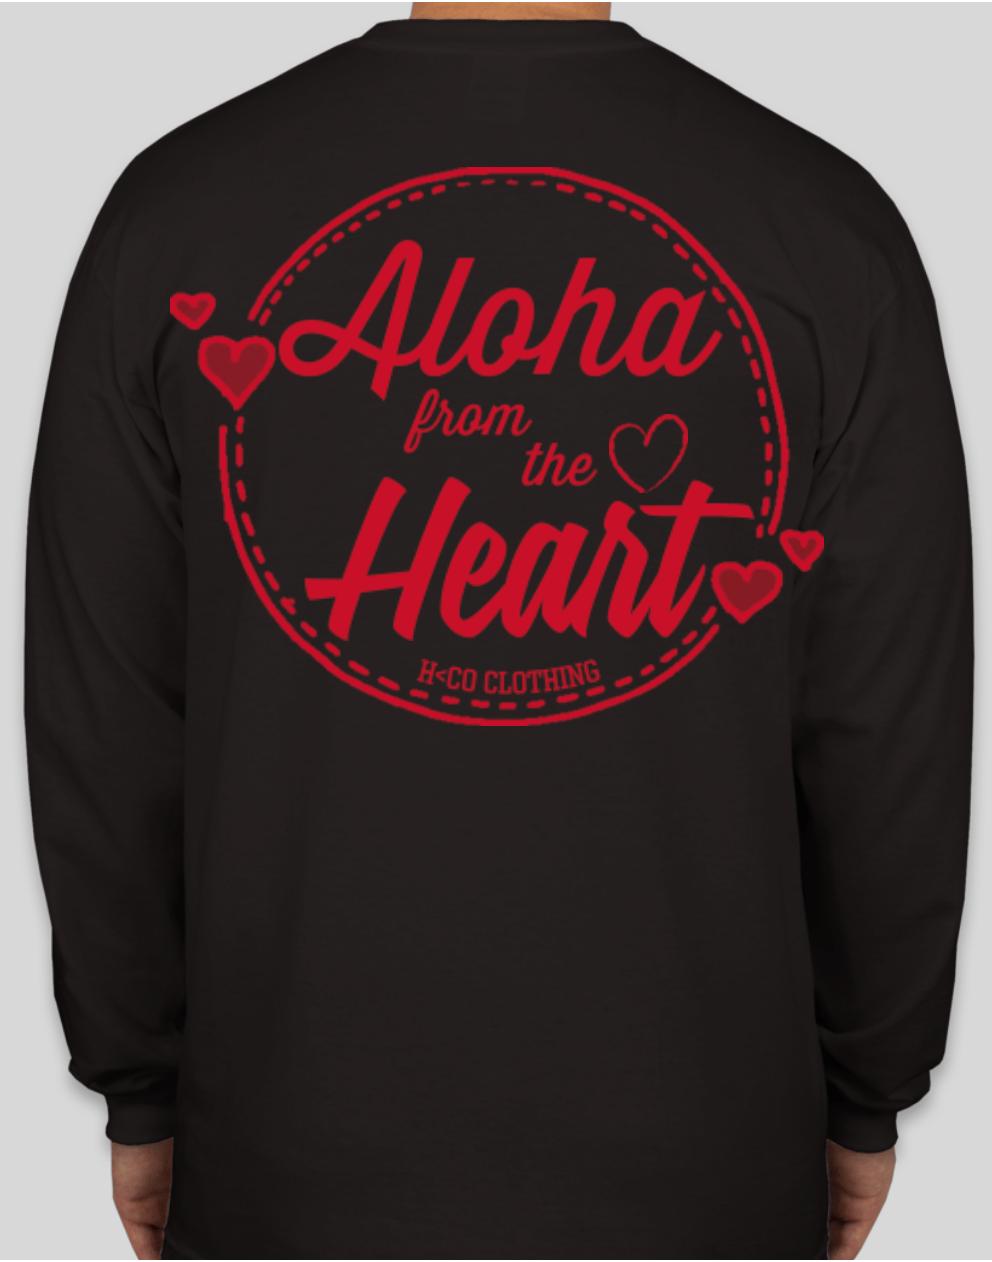 Aloha from the Heart Long Sleeve (Adult)